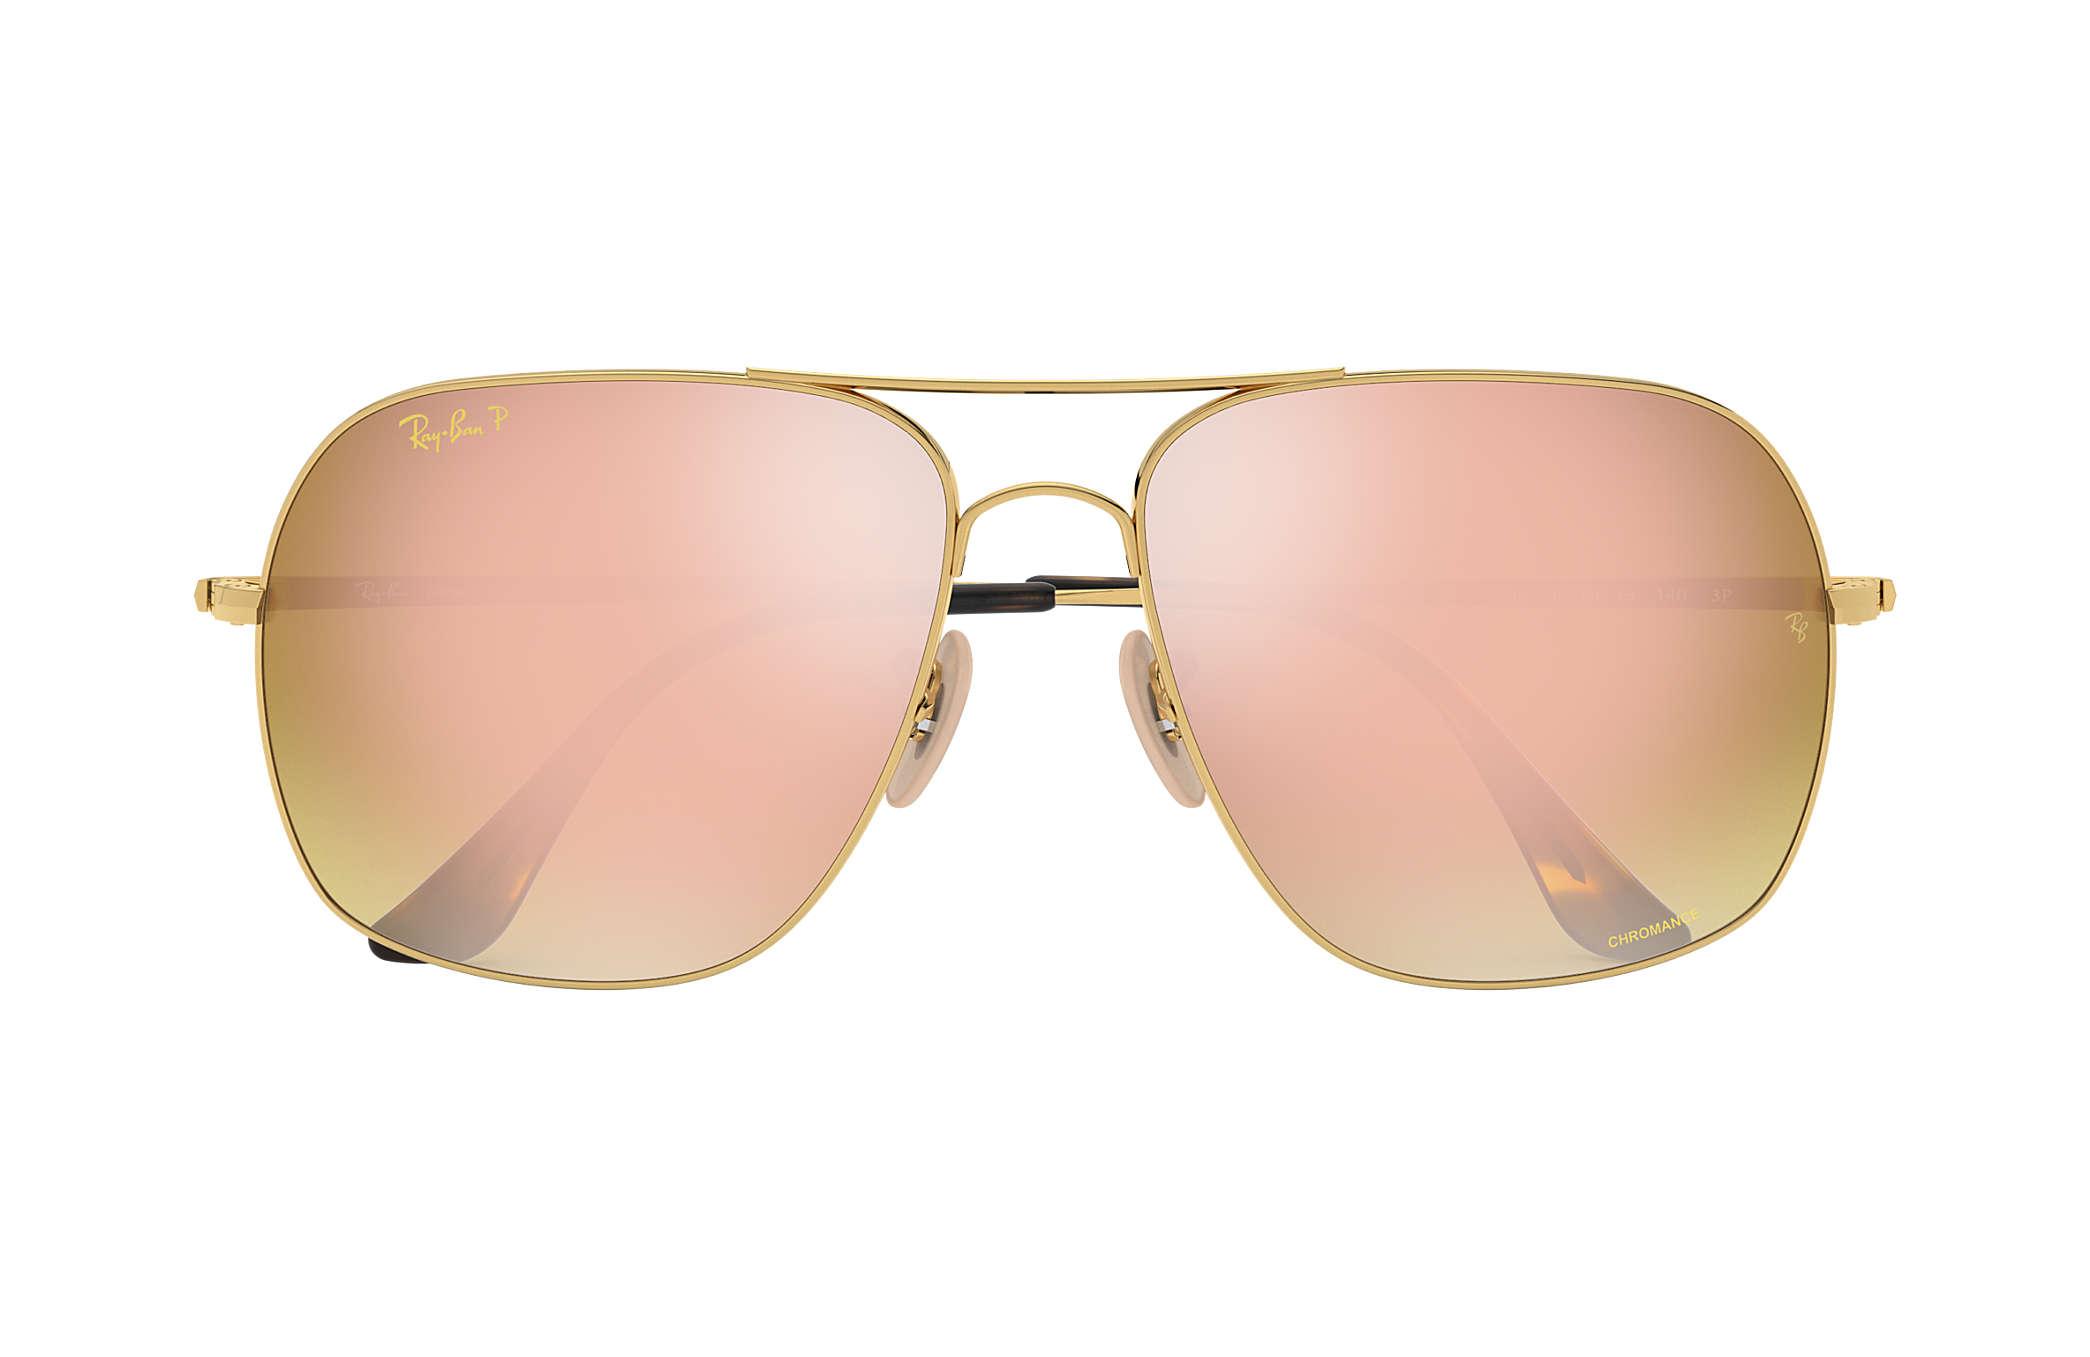 92ec6019ee Ray-Ban Rb3587 Chromance RB3587CH Gold - Metal - Pink Polarized ...